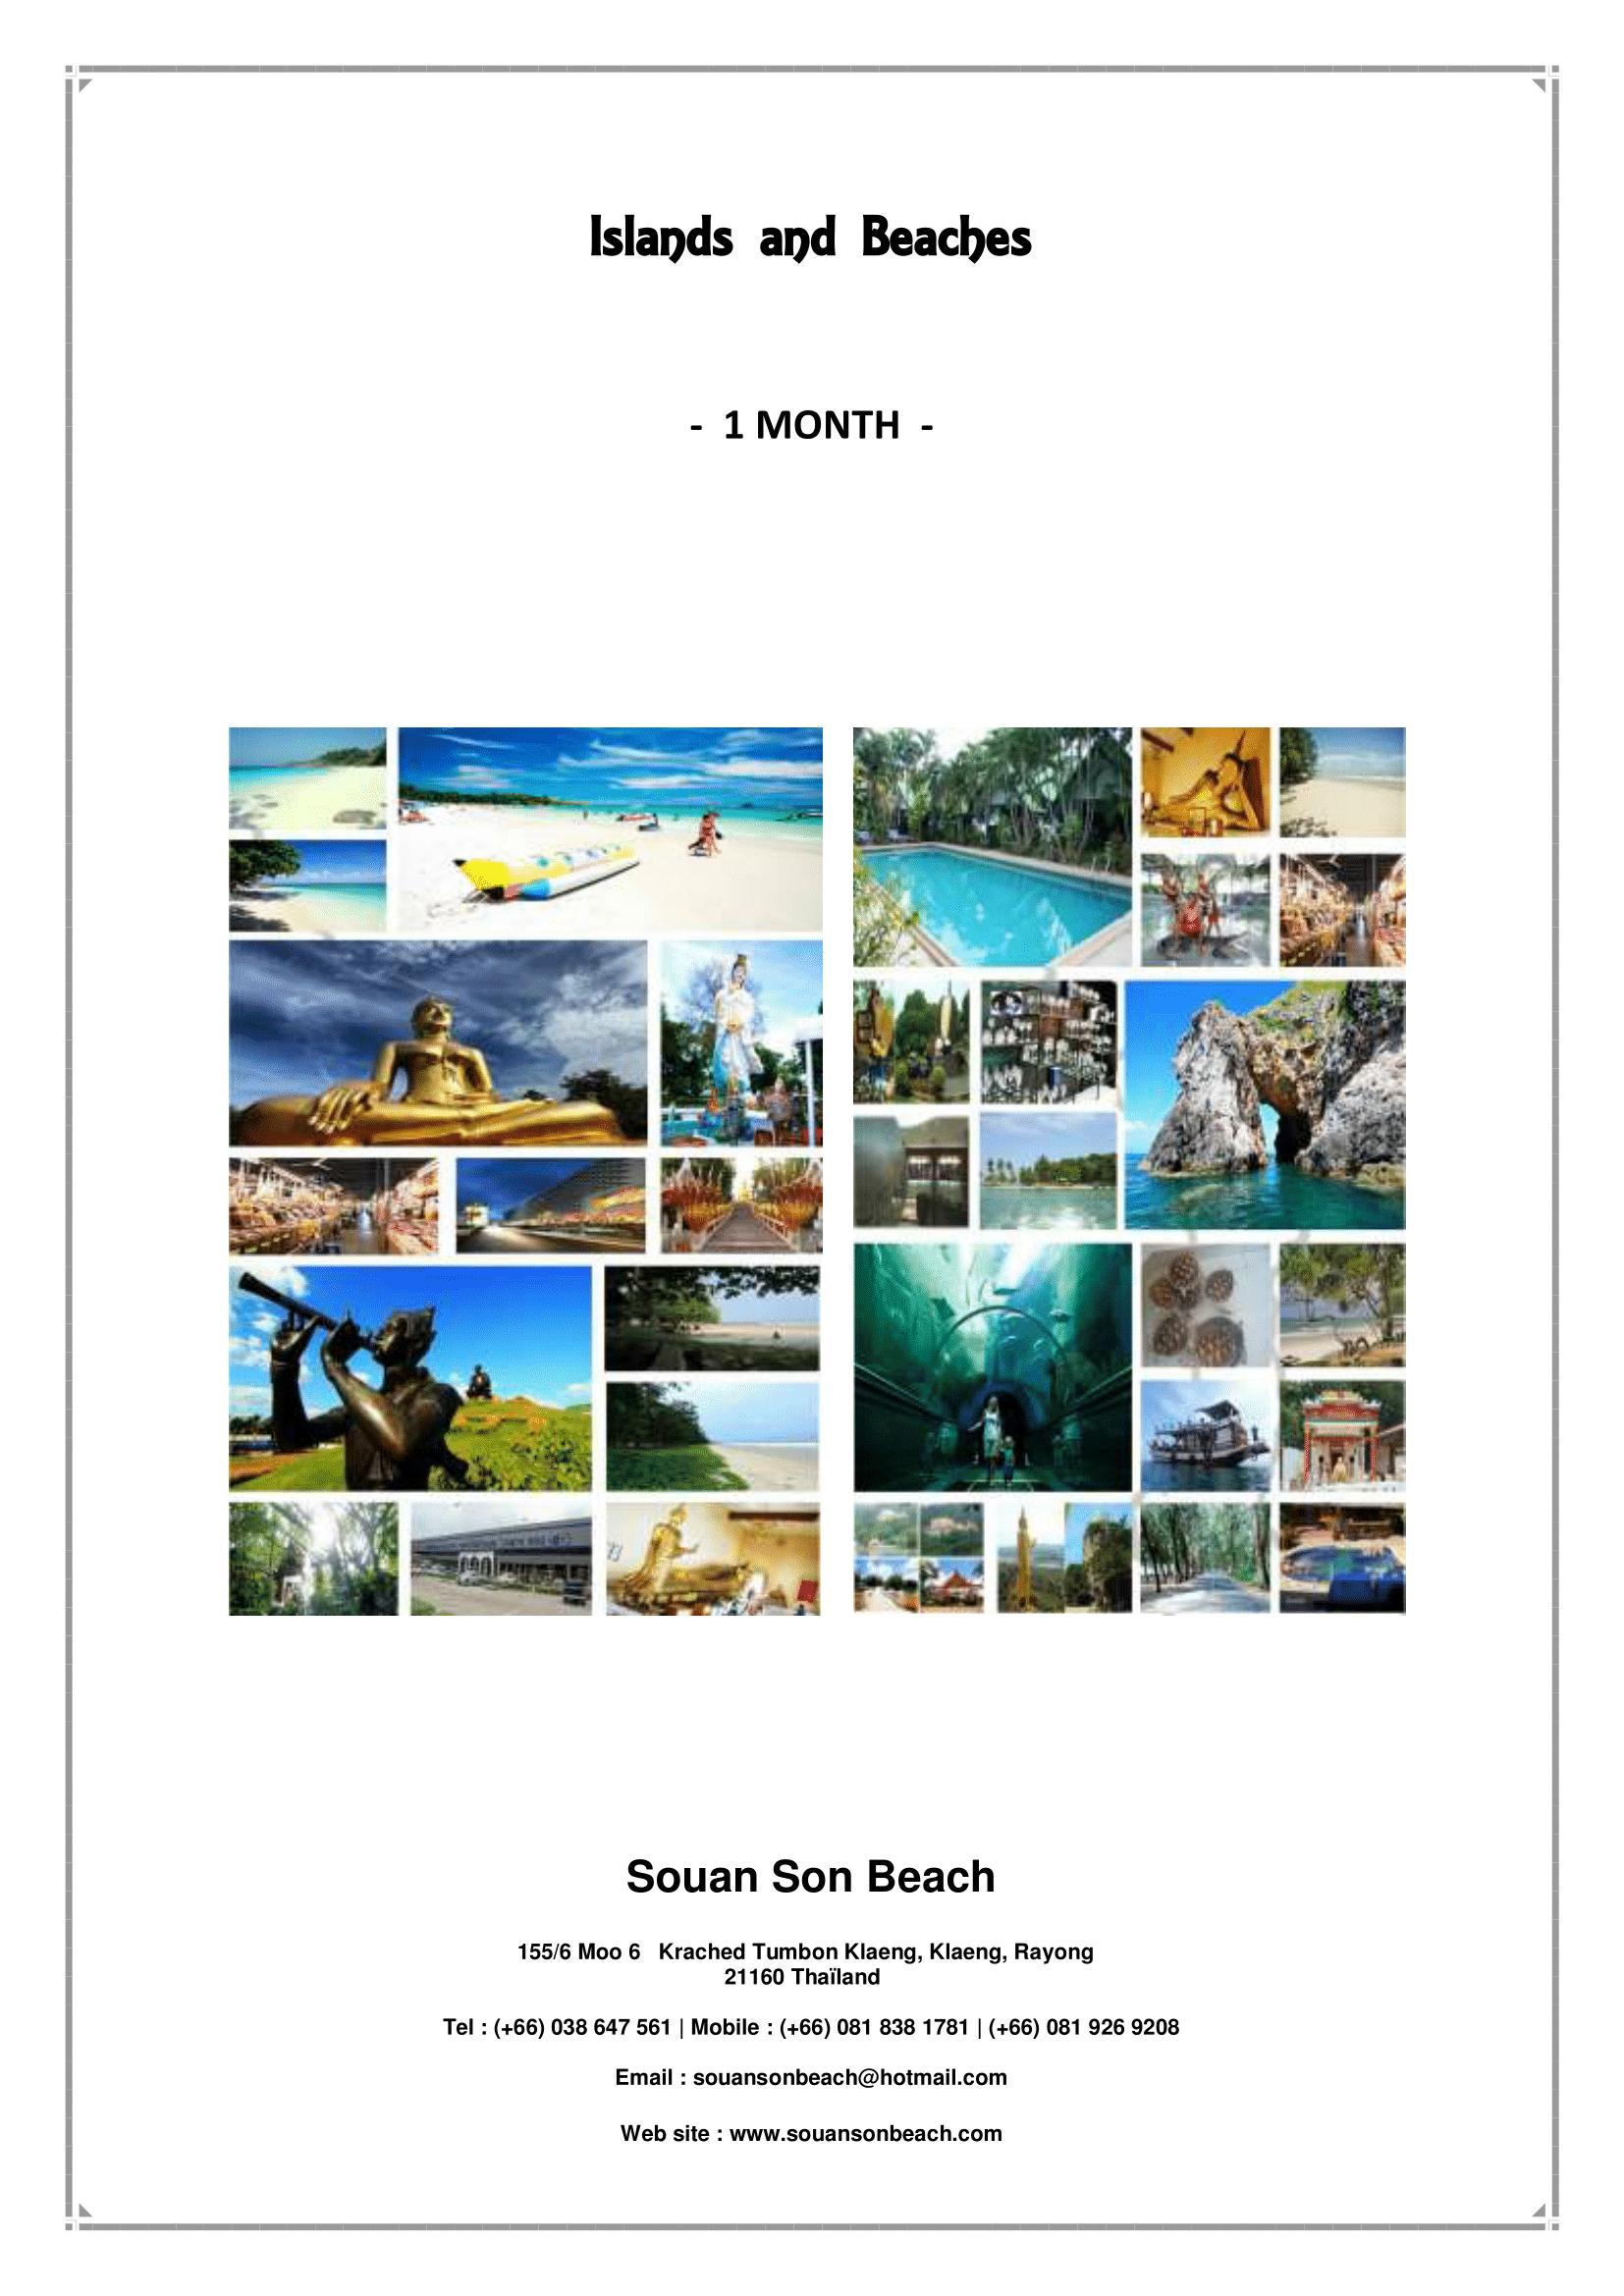 Islands & Beaches 1M